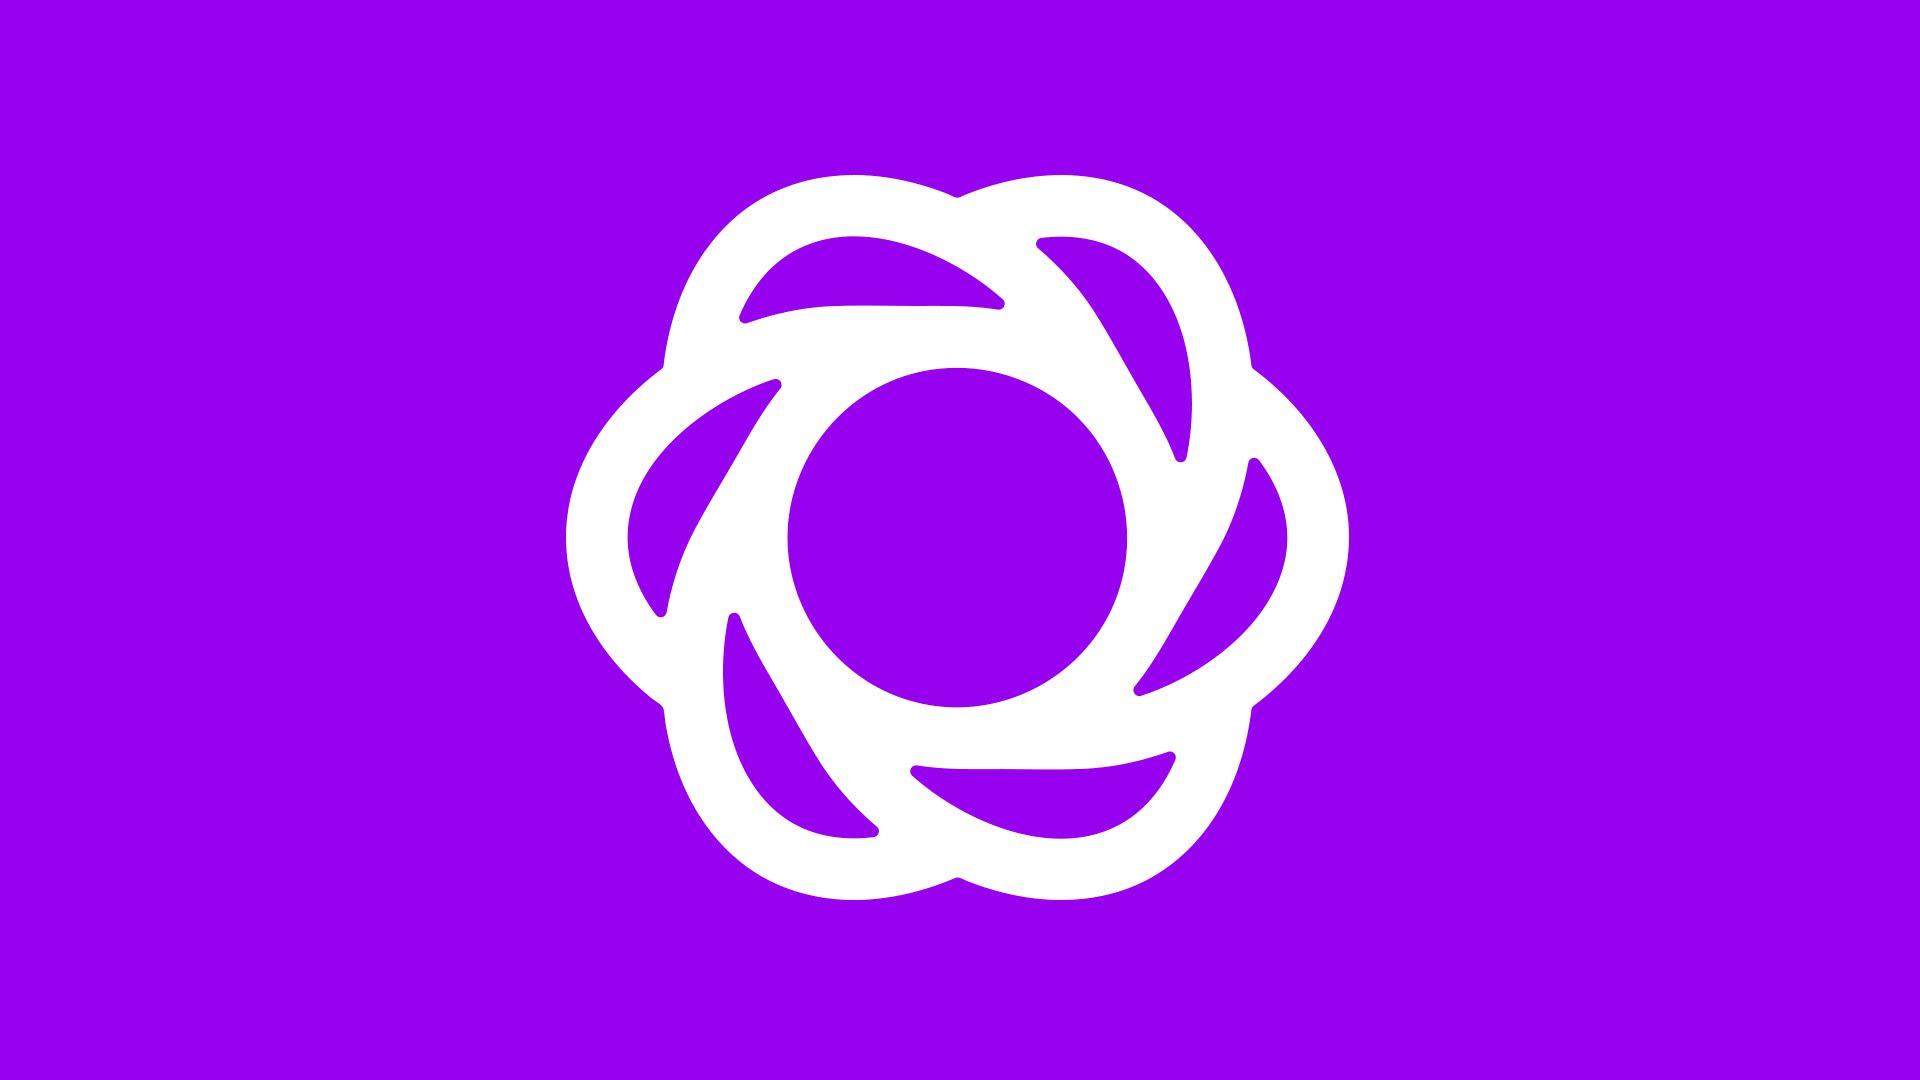 Bloom - Lead Generation plugin for Wordpress